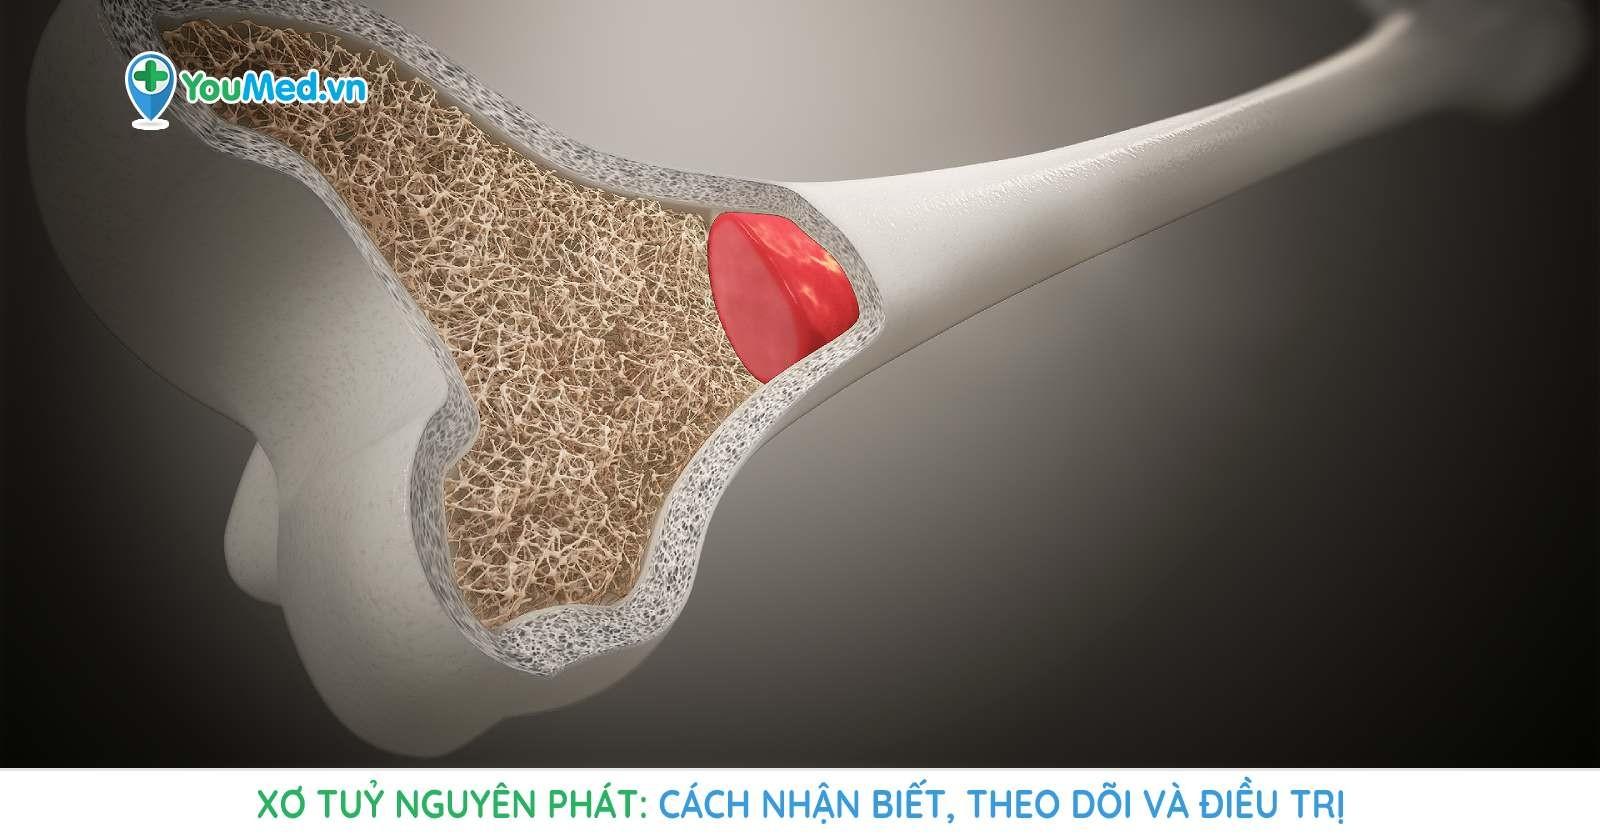 xo-tuy-nguyen-phat-cach-nhan-biet-theo-doi-va-dieu-tri